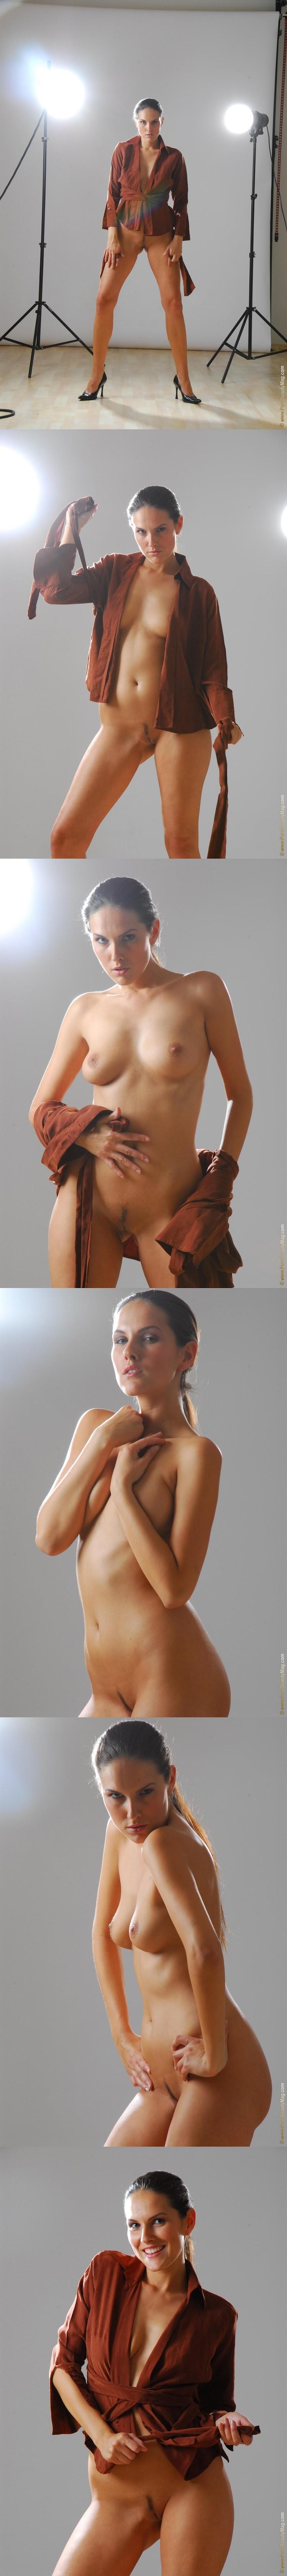 PureBeautyMag PBM  - 2007-06-10 - #s361276 - Dagmar J - Meow - 3872pxReal Street Angels